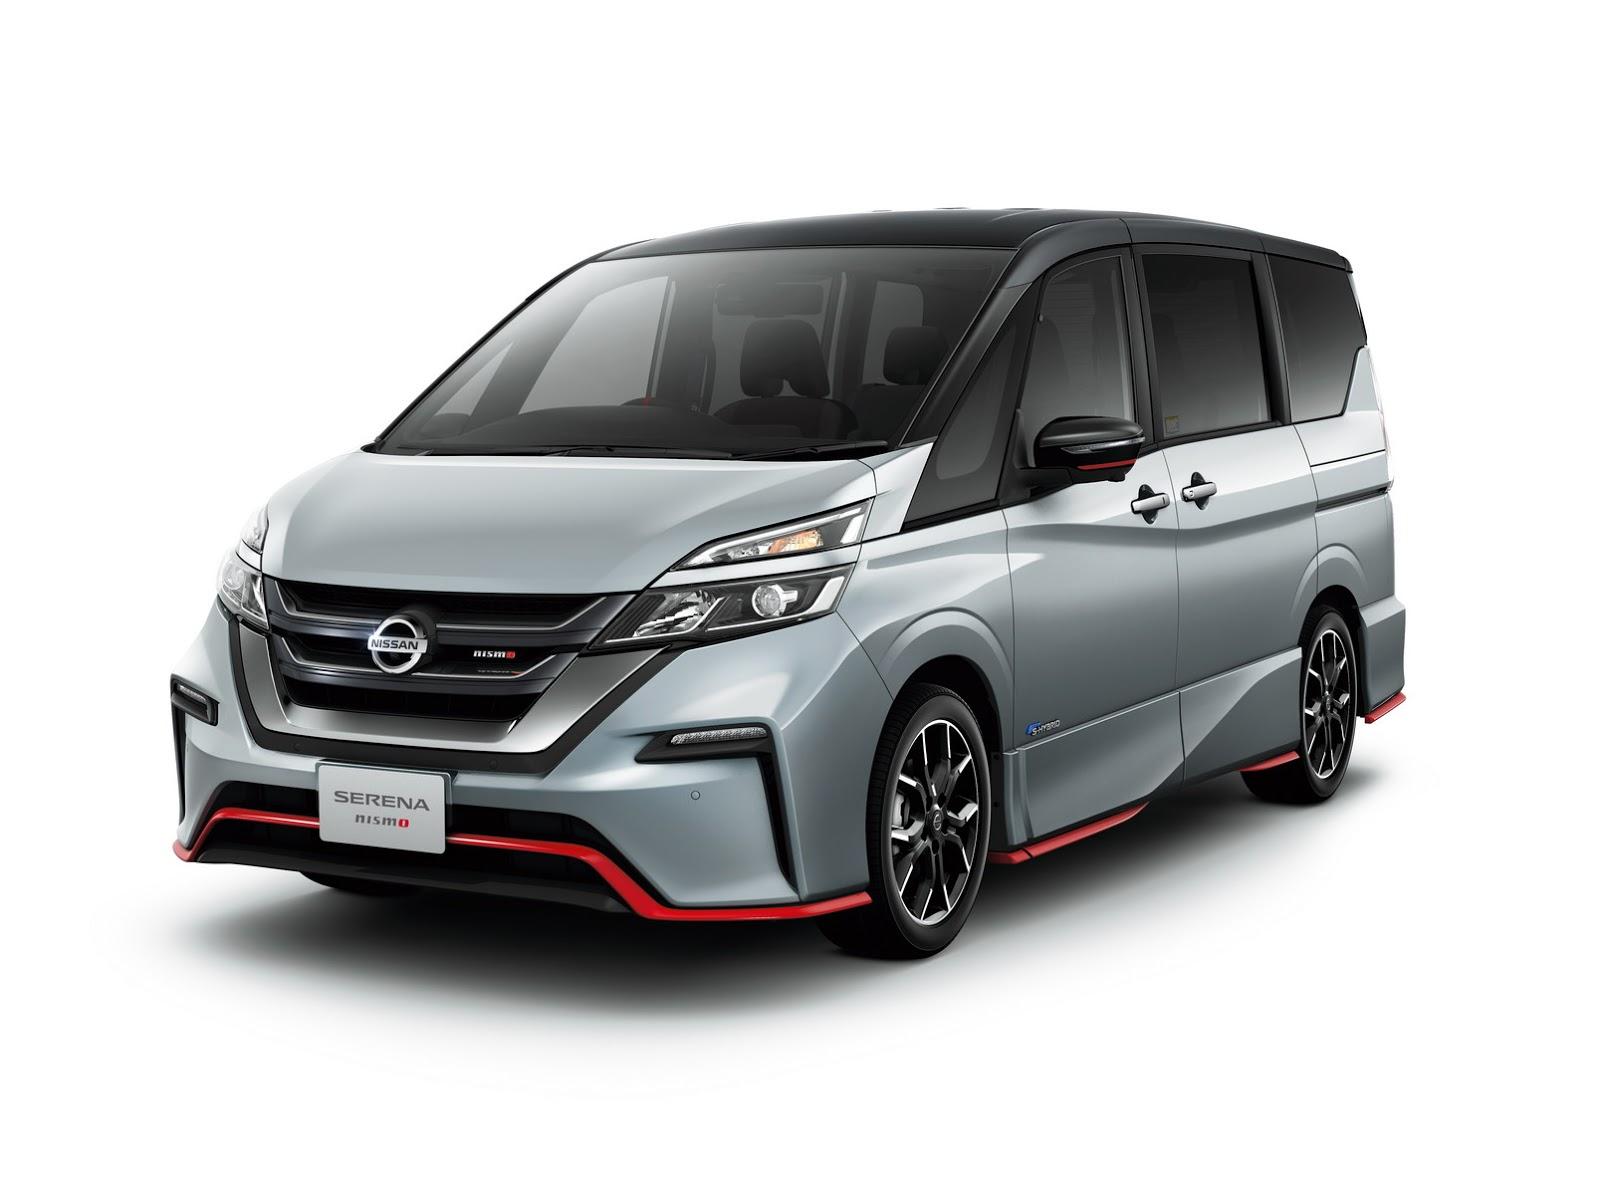 Nissan_Serena_Nismo_16